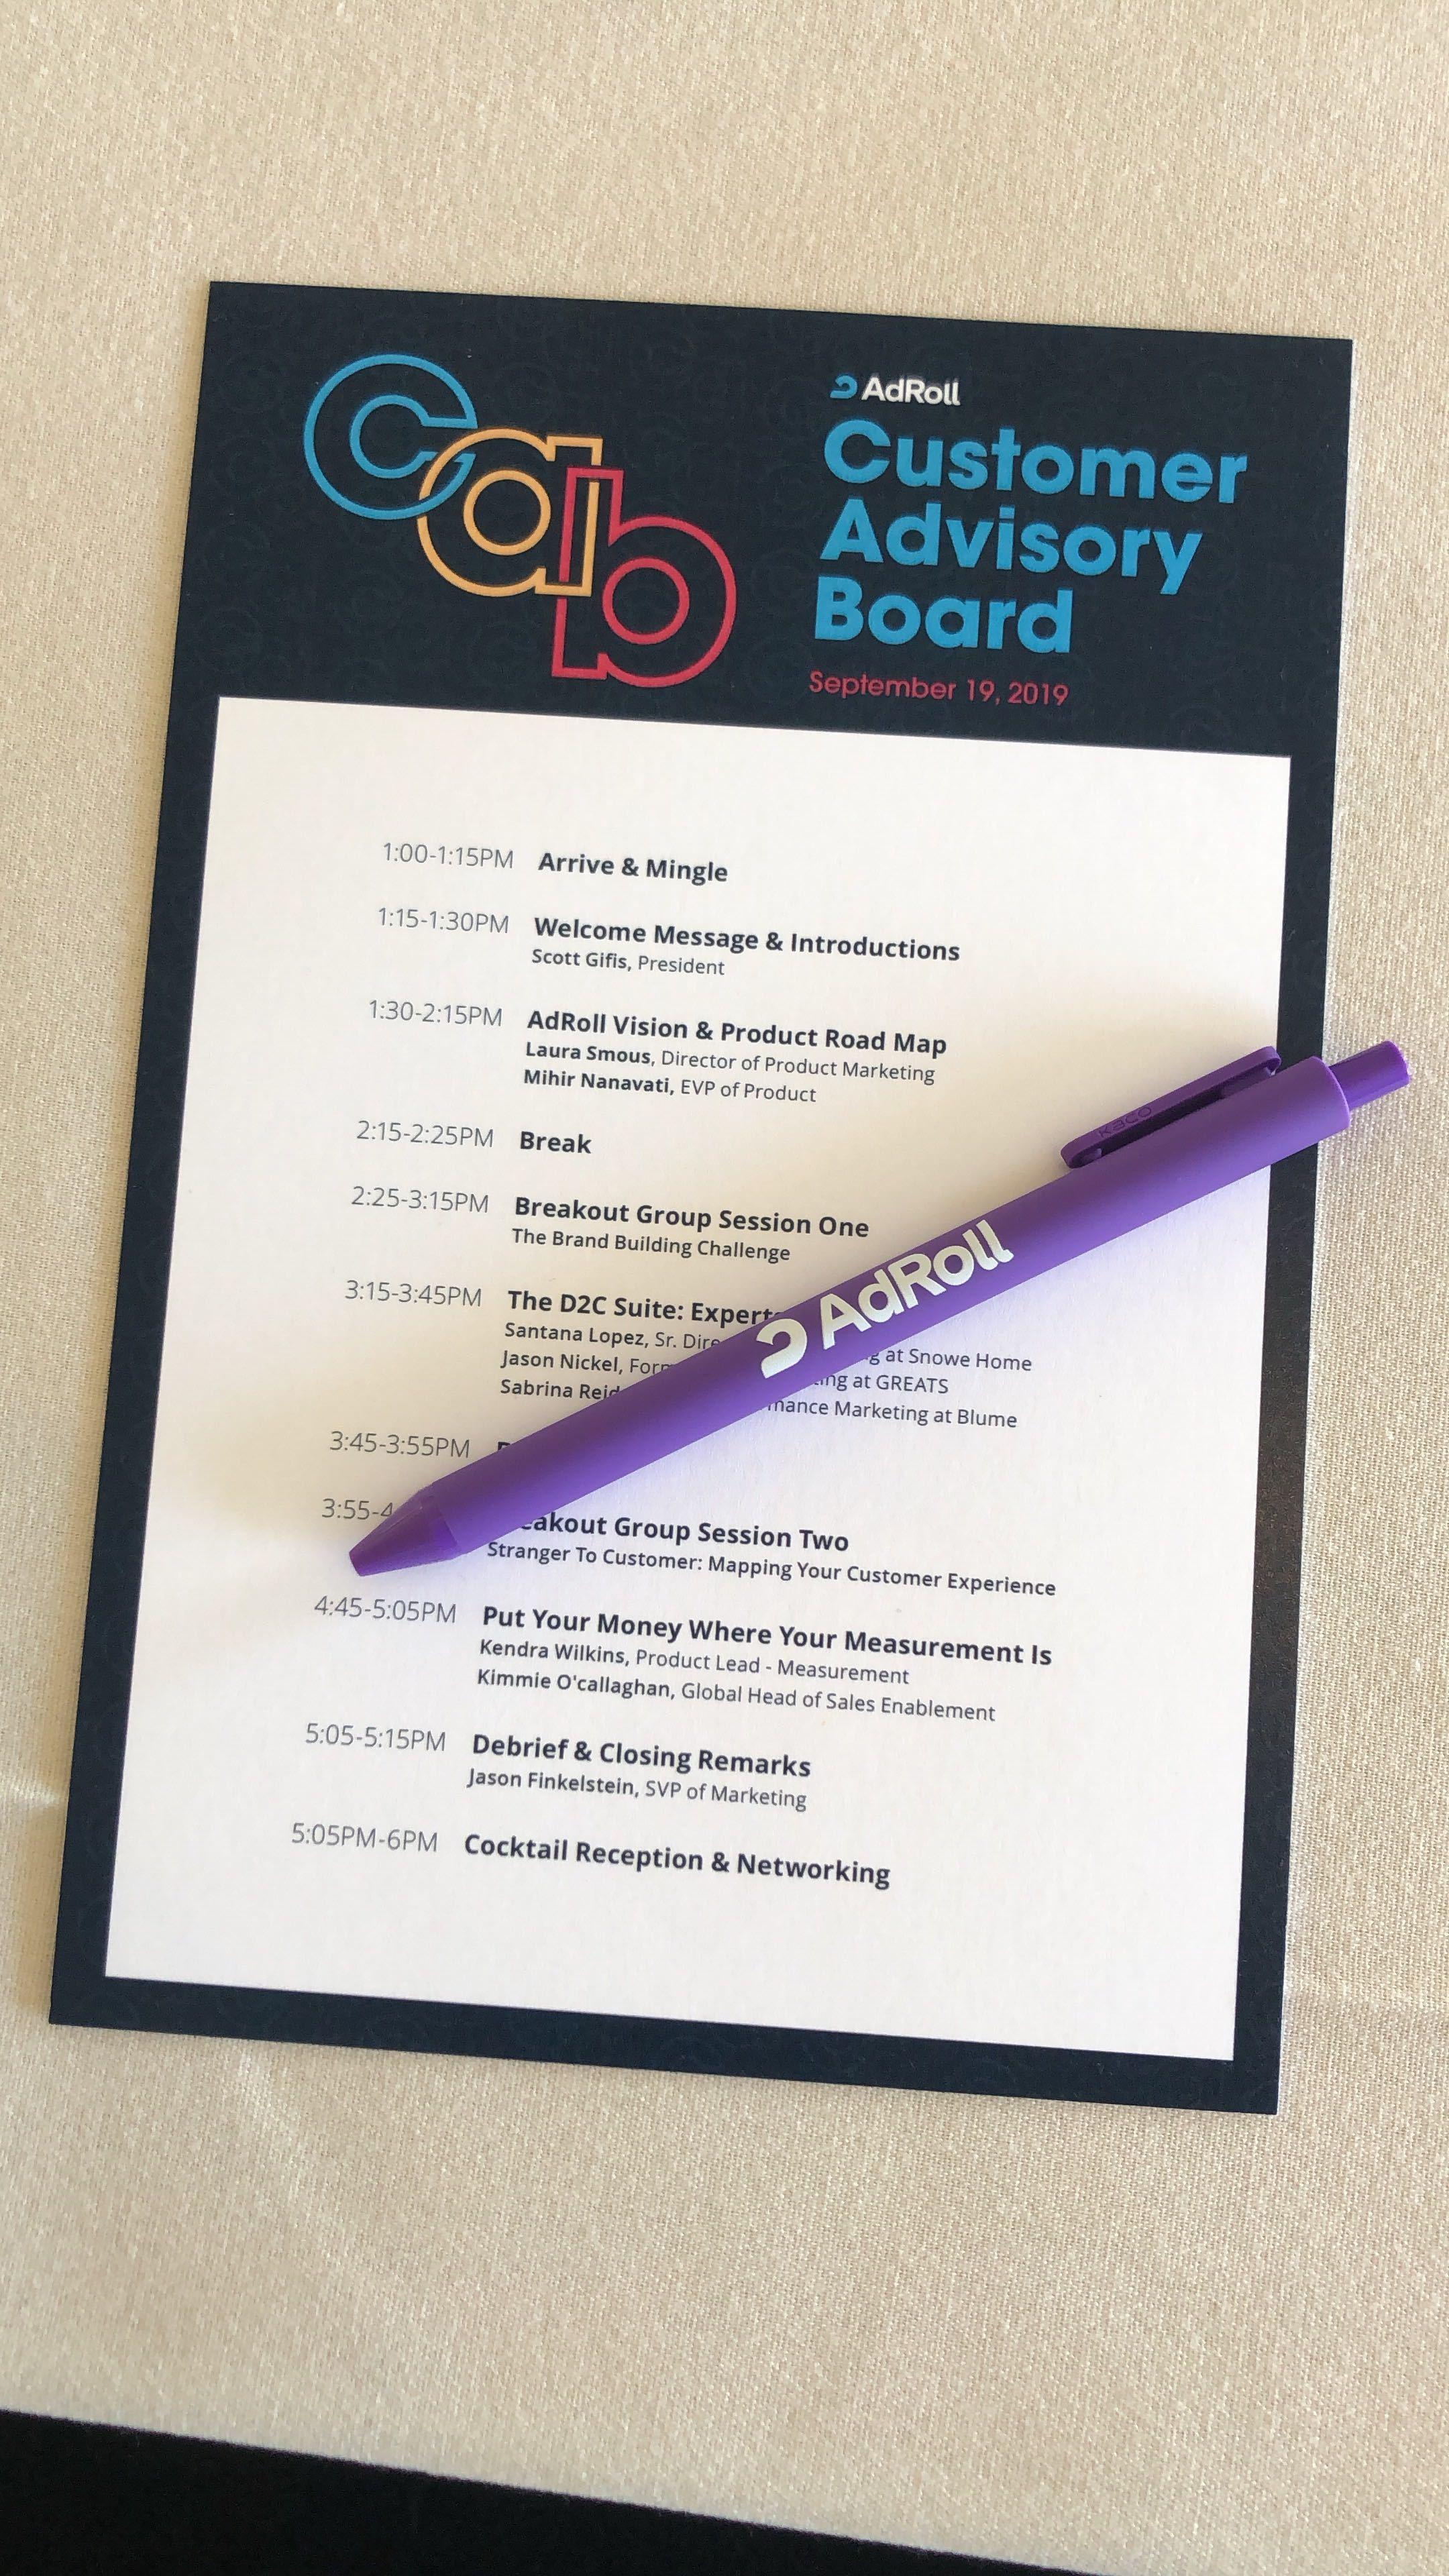 AdRoll's 2019 Customer Advisory Board agenda